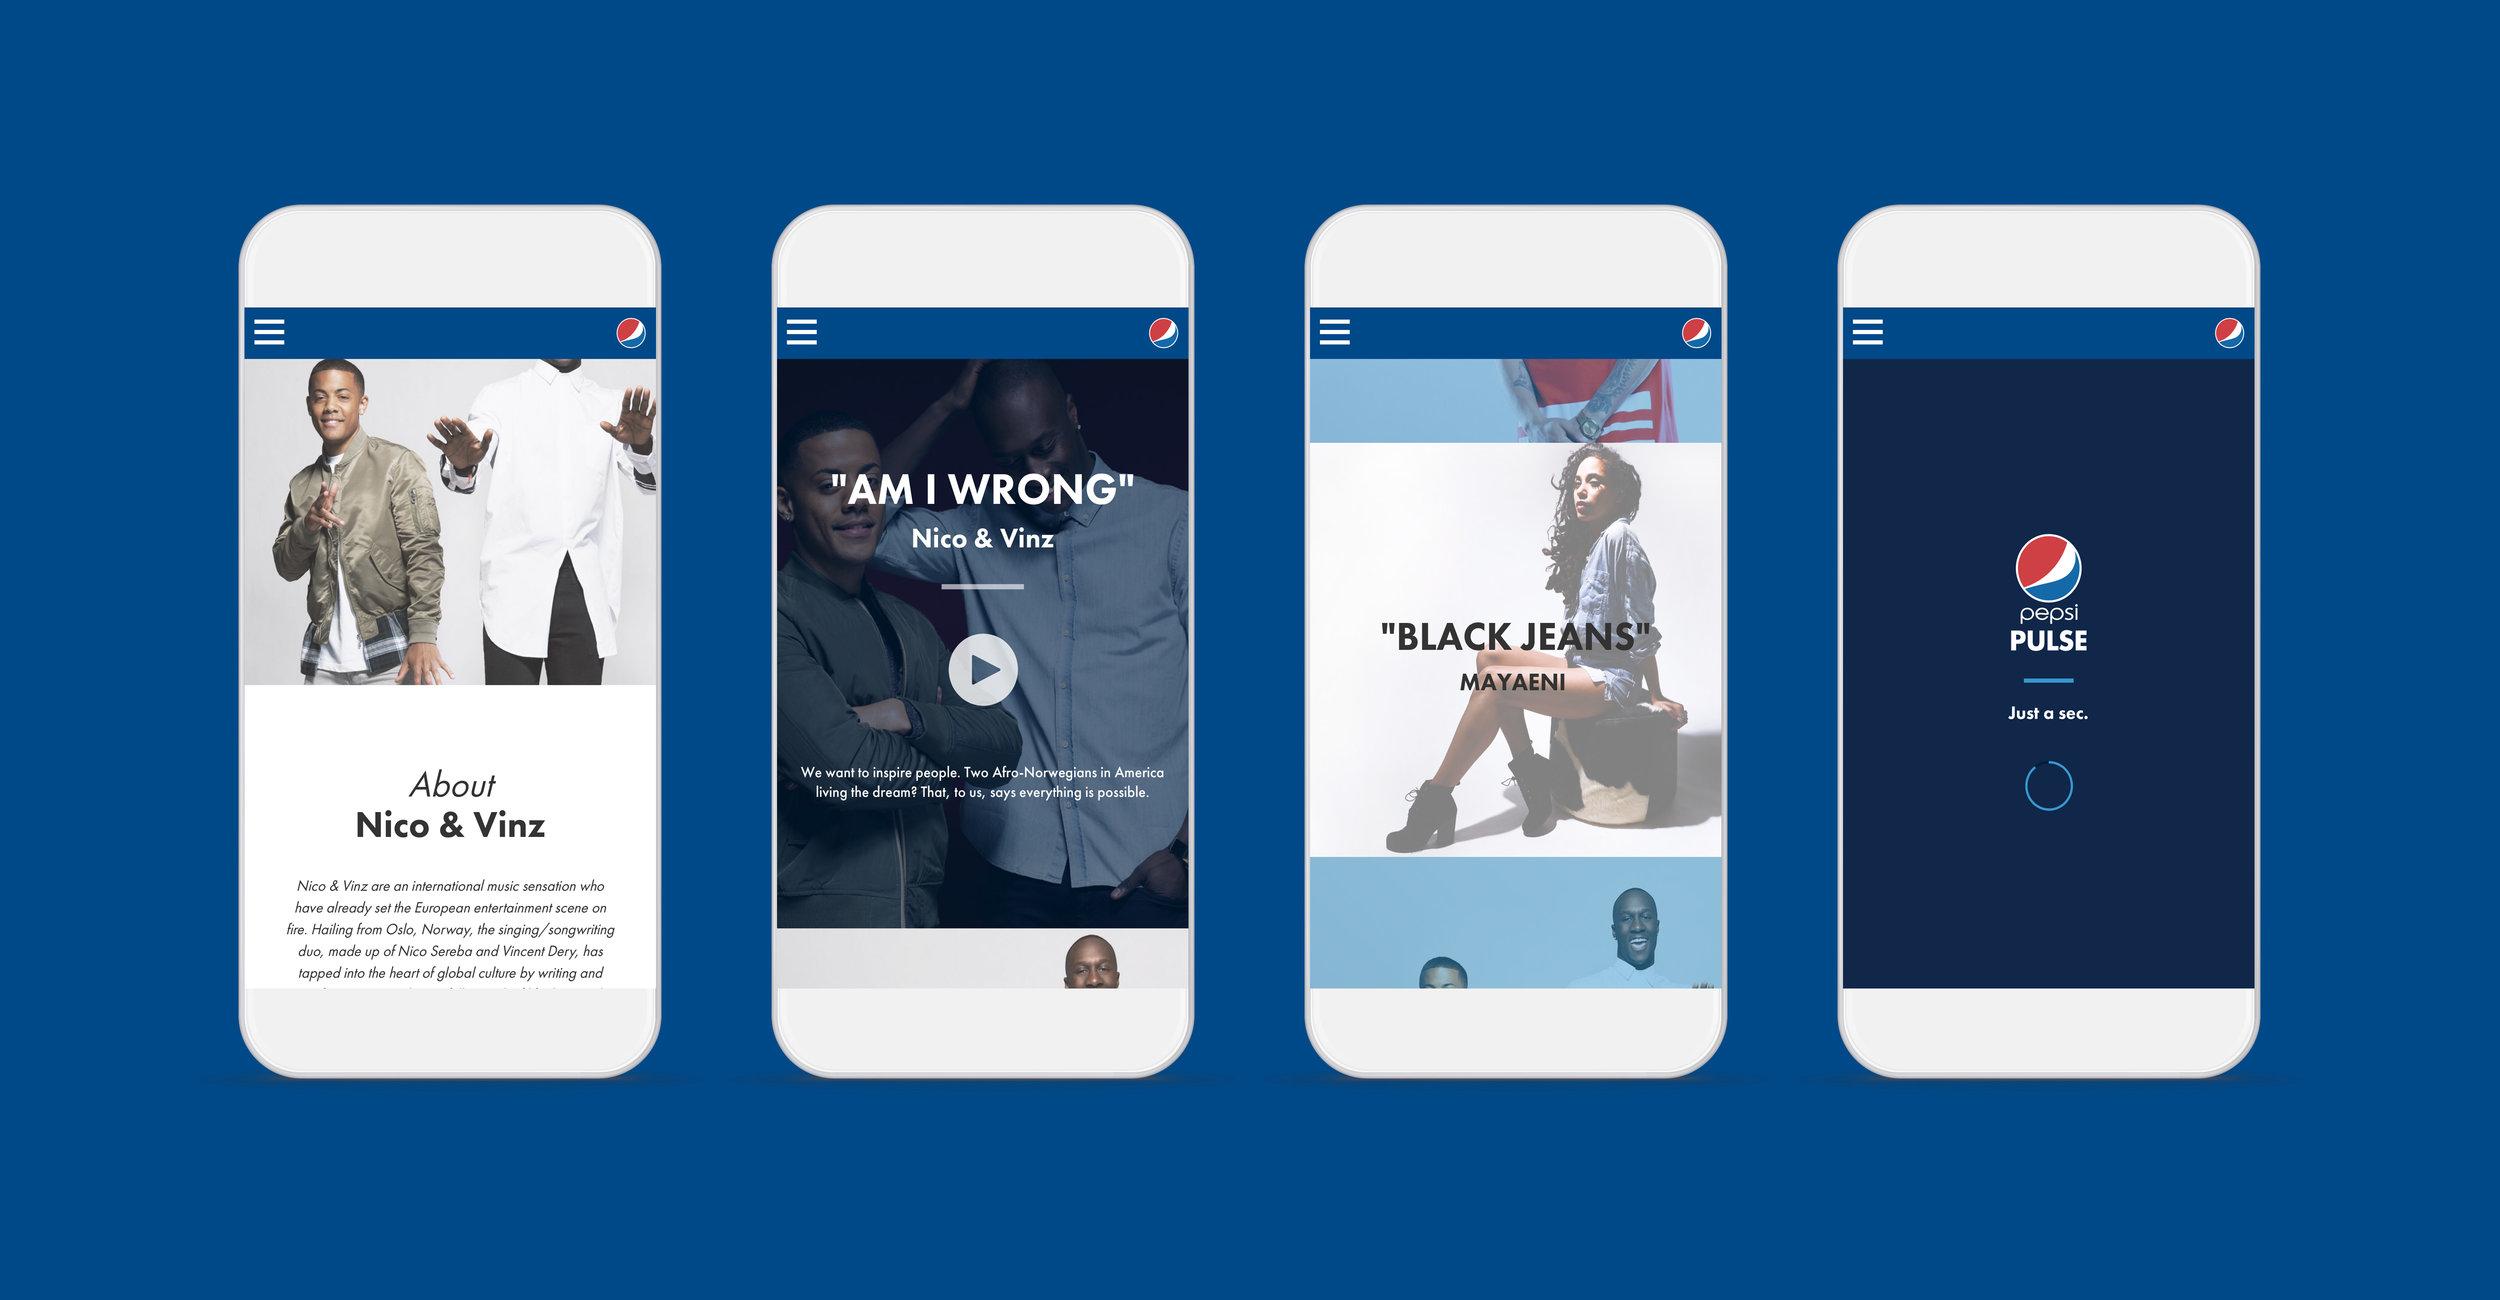 Pepsi-pulse-iphone-mockups.jpg